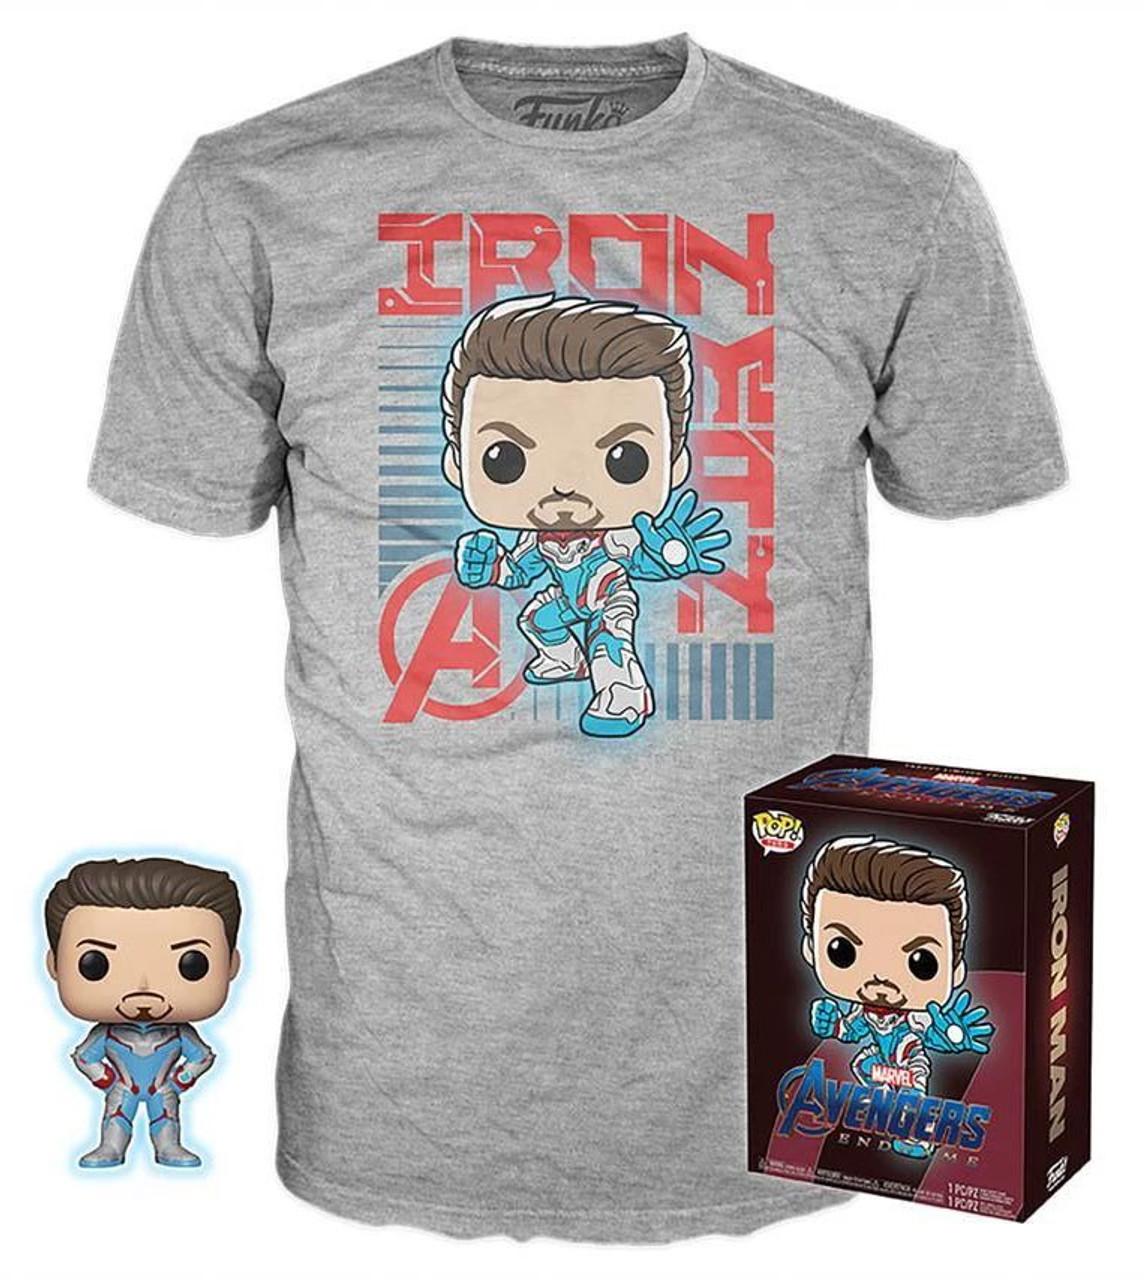 cea113d5 Funko Marvel Avengers Endgame Funko POP Marvel Iron Man Exclusive Vinyl  Figure T-Shirt X-Large - ToyWiz